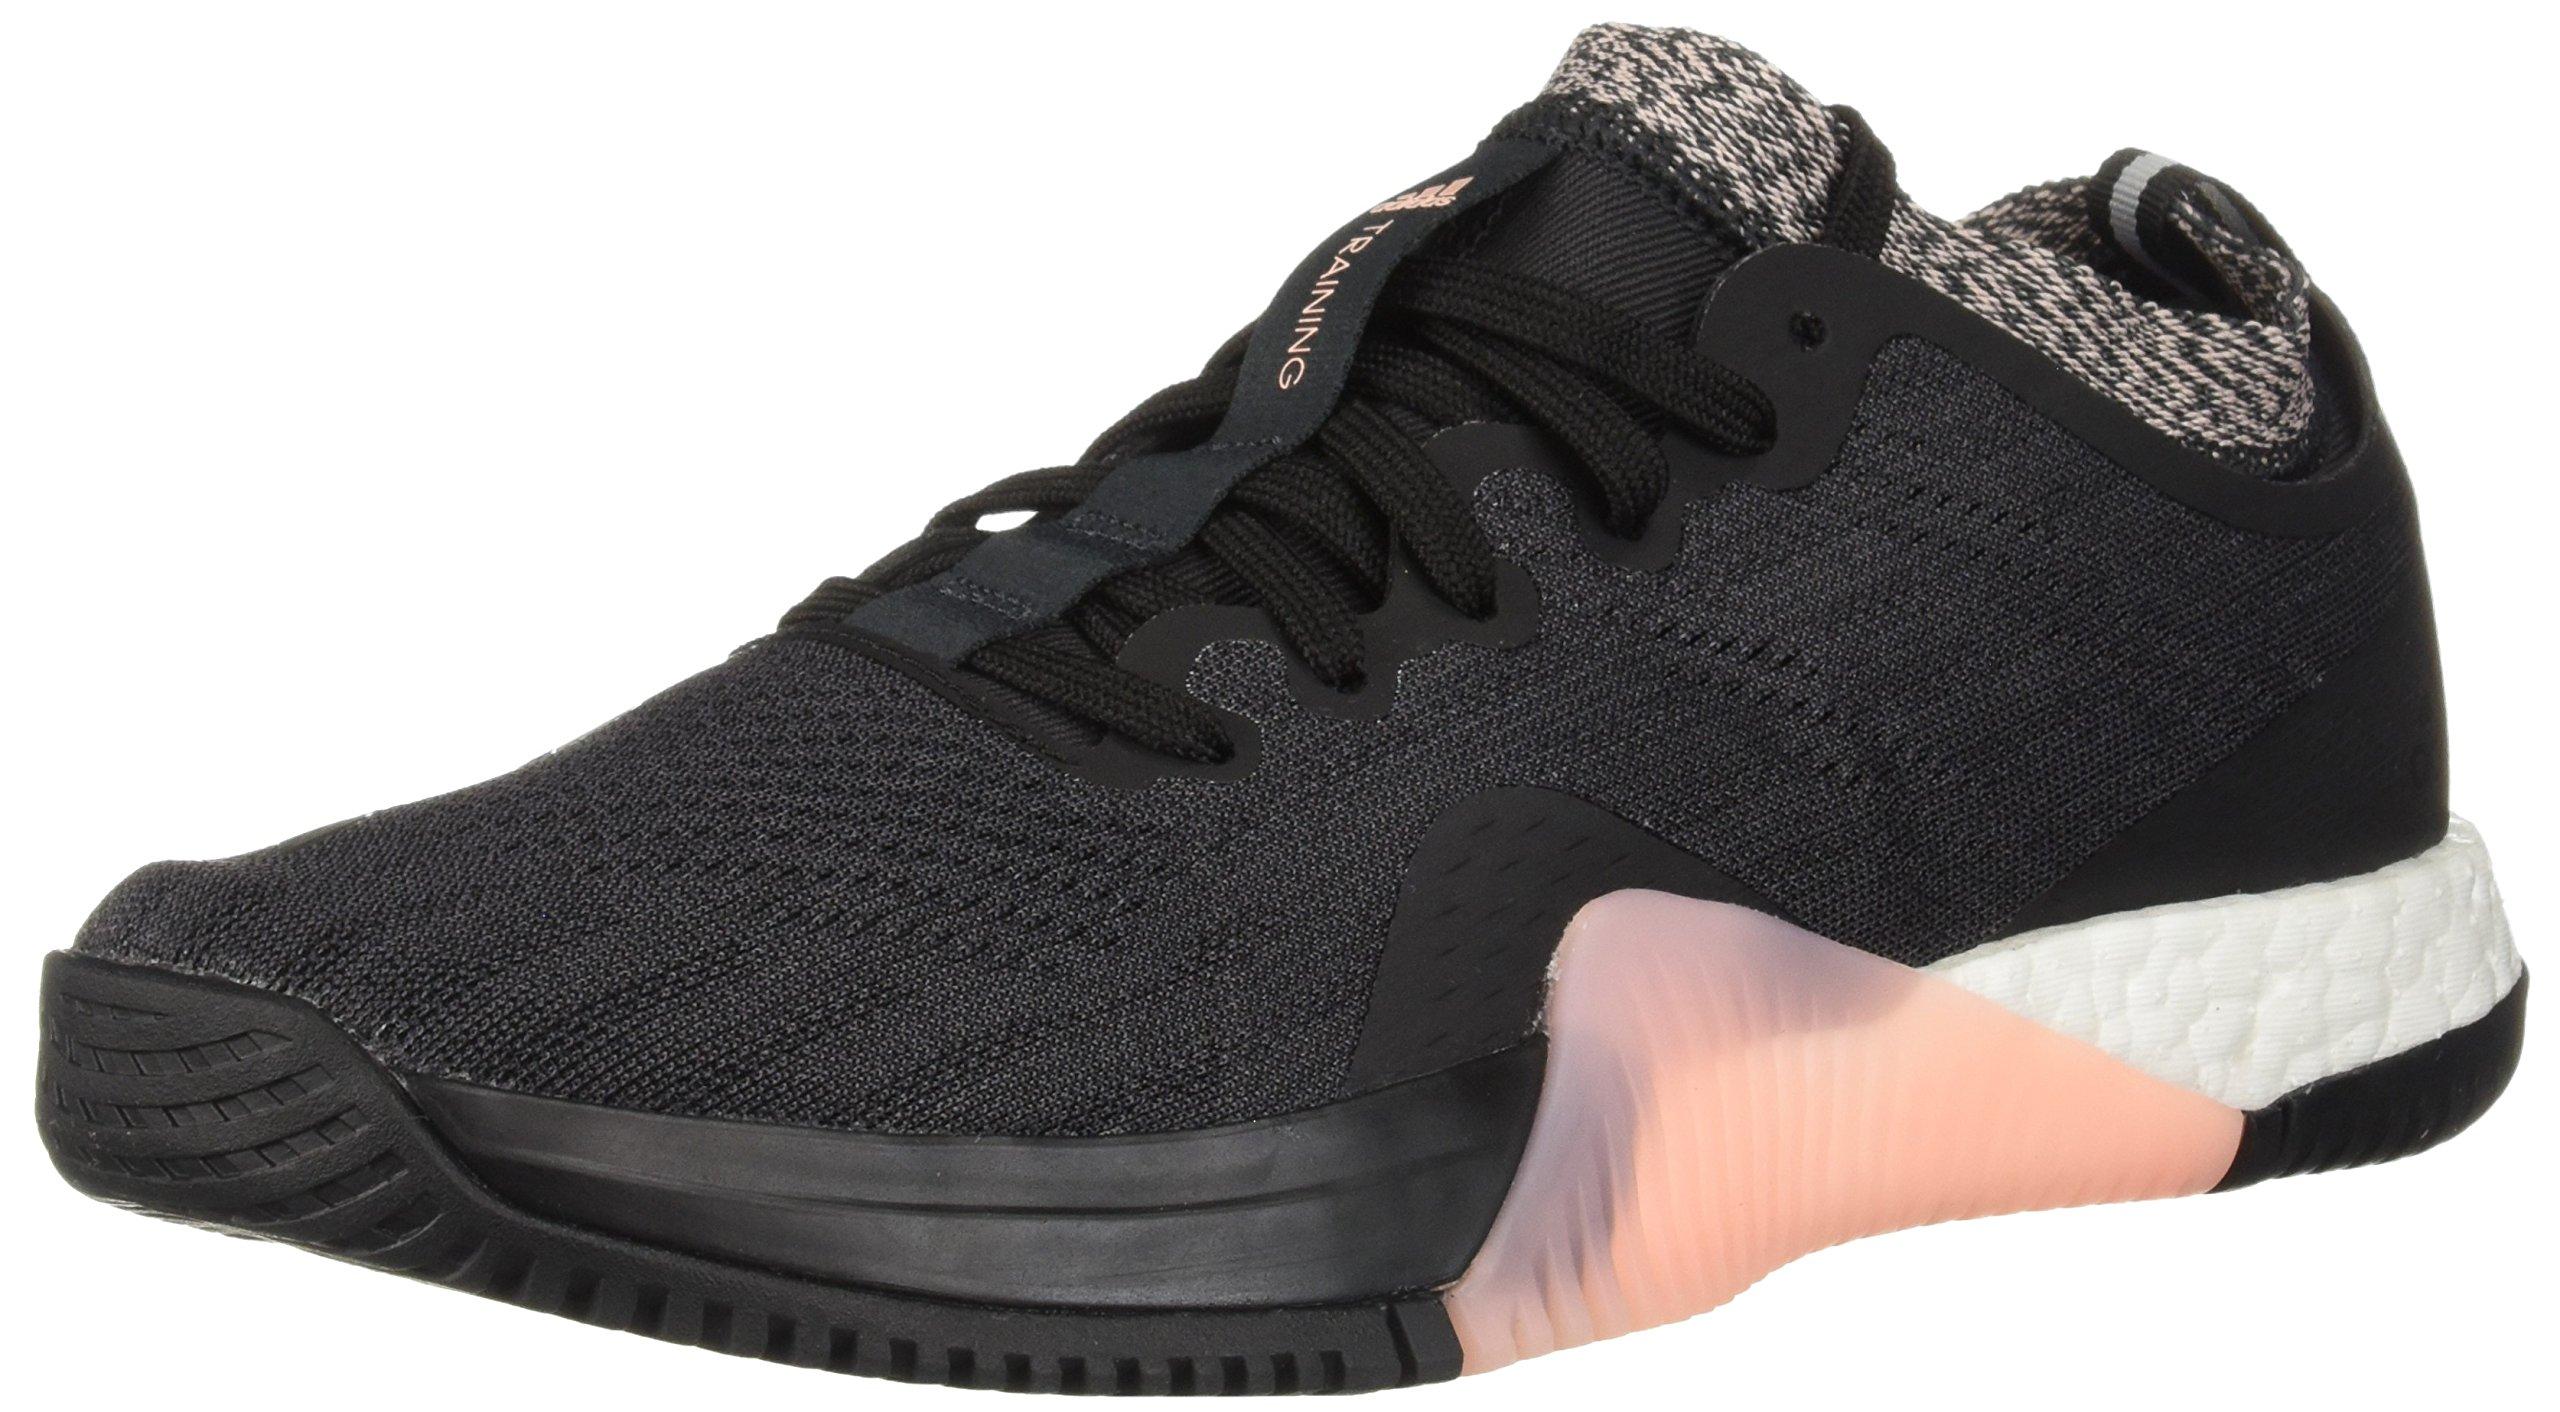 adidas Women's Crazytrain Elite Cross Trainer, Black/Carbon/Clear Orange, 5 M US